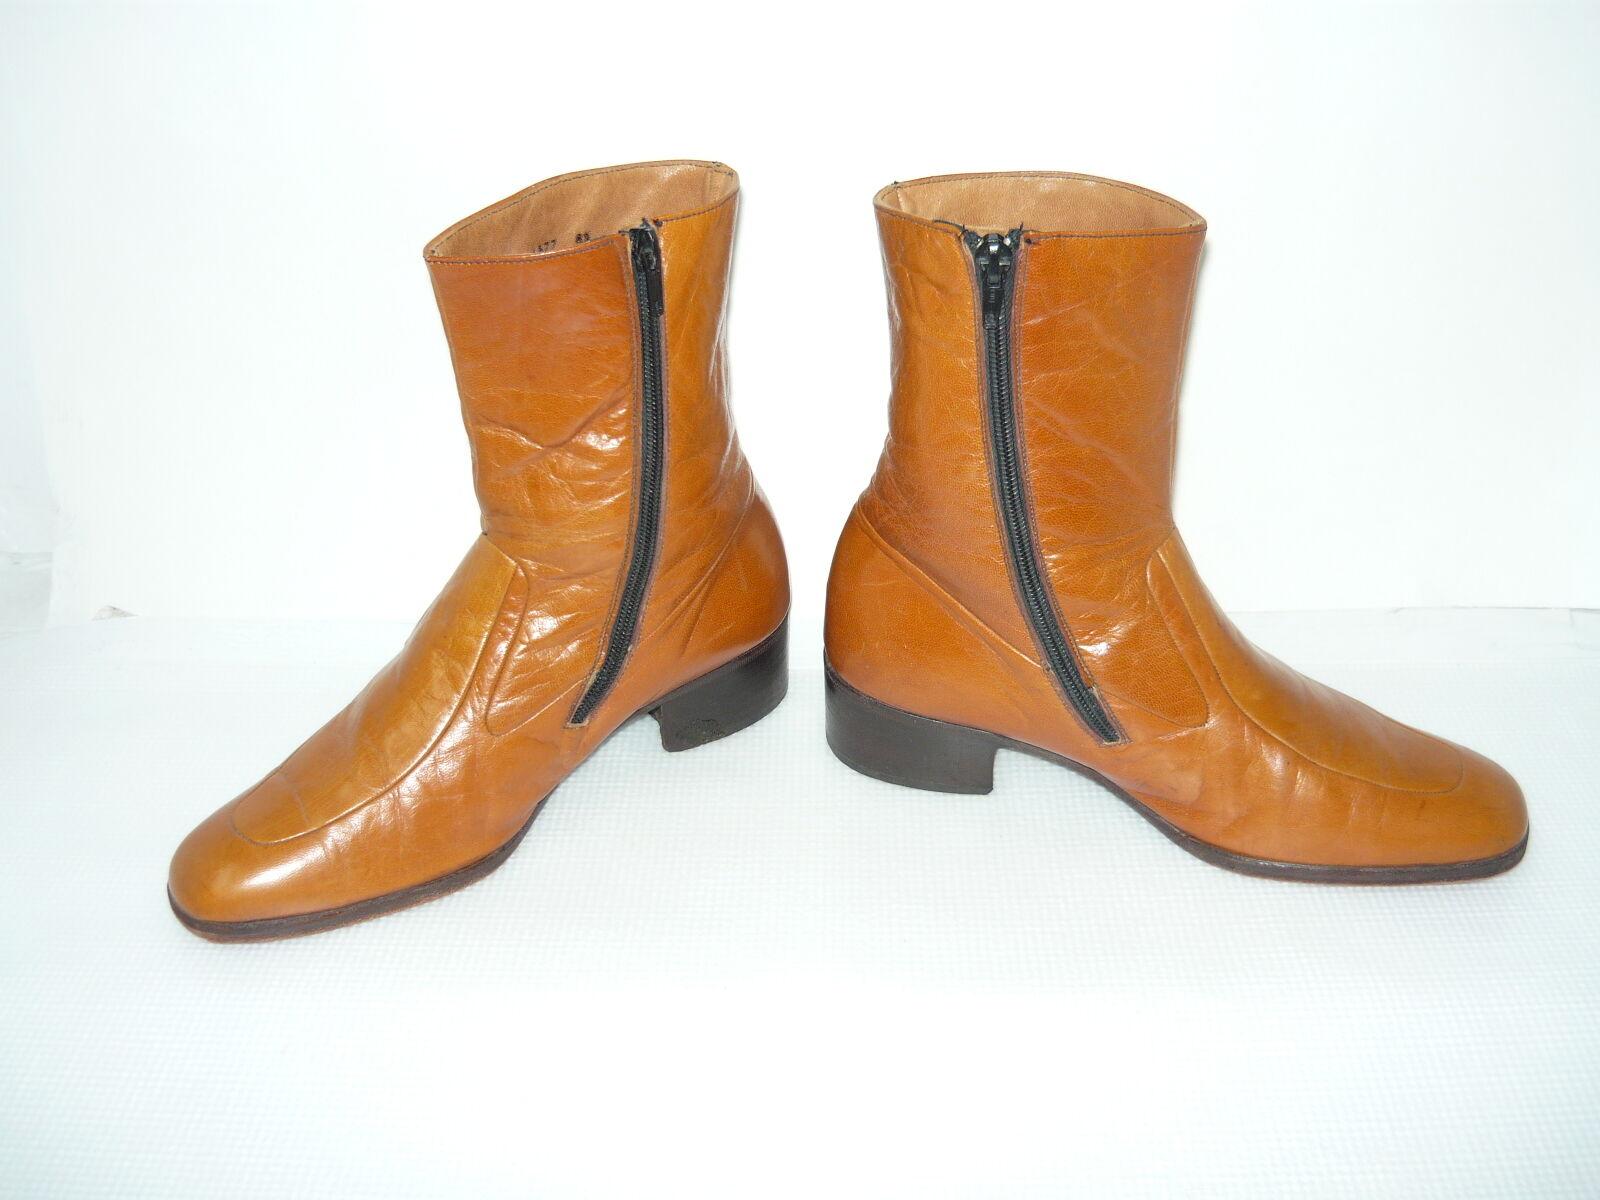 Vintage Ambassador Braun  Leder Damenschuhe Stiefel Niedrig Heel  Braun Sz 8.5 908a54